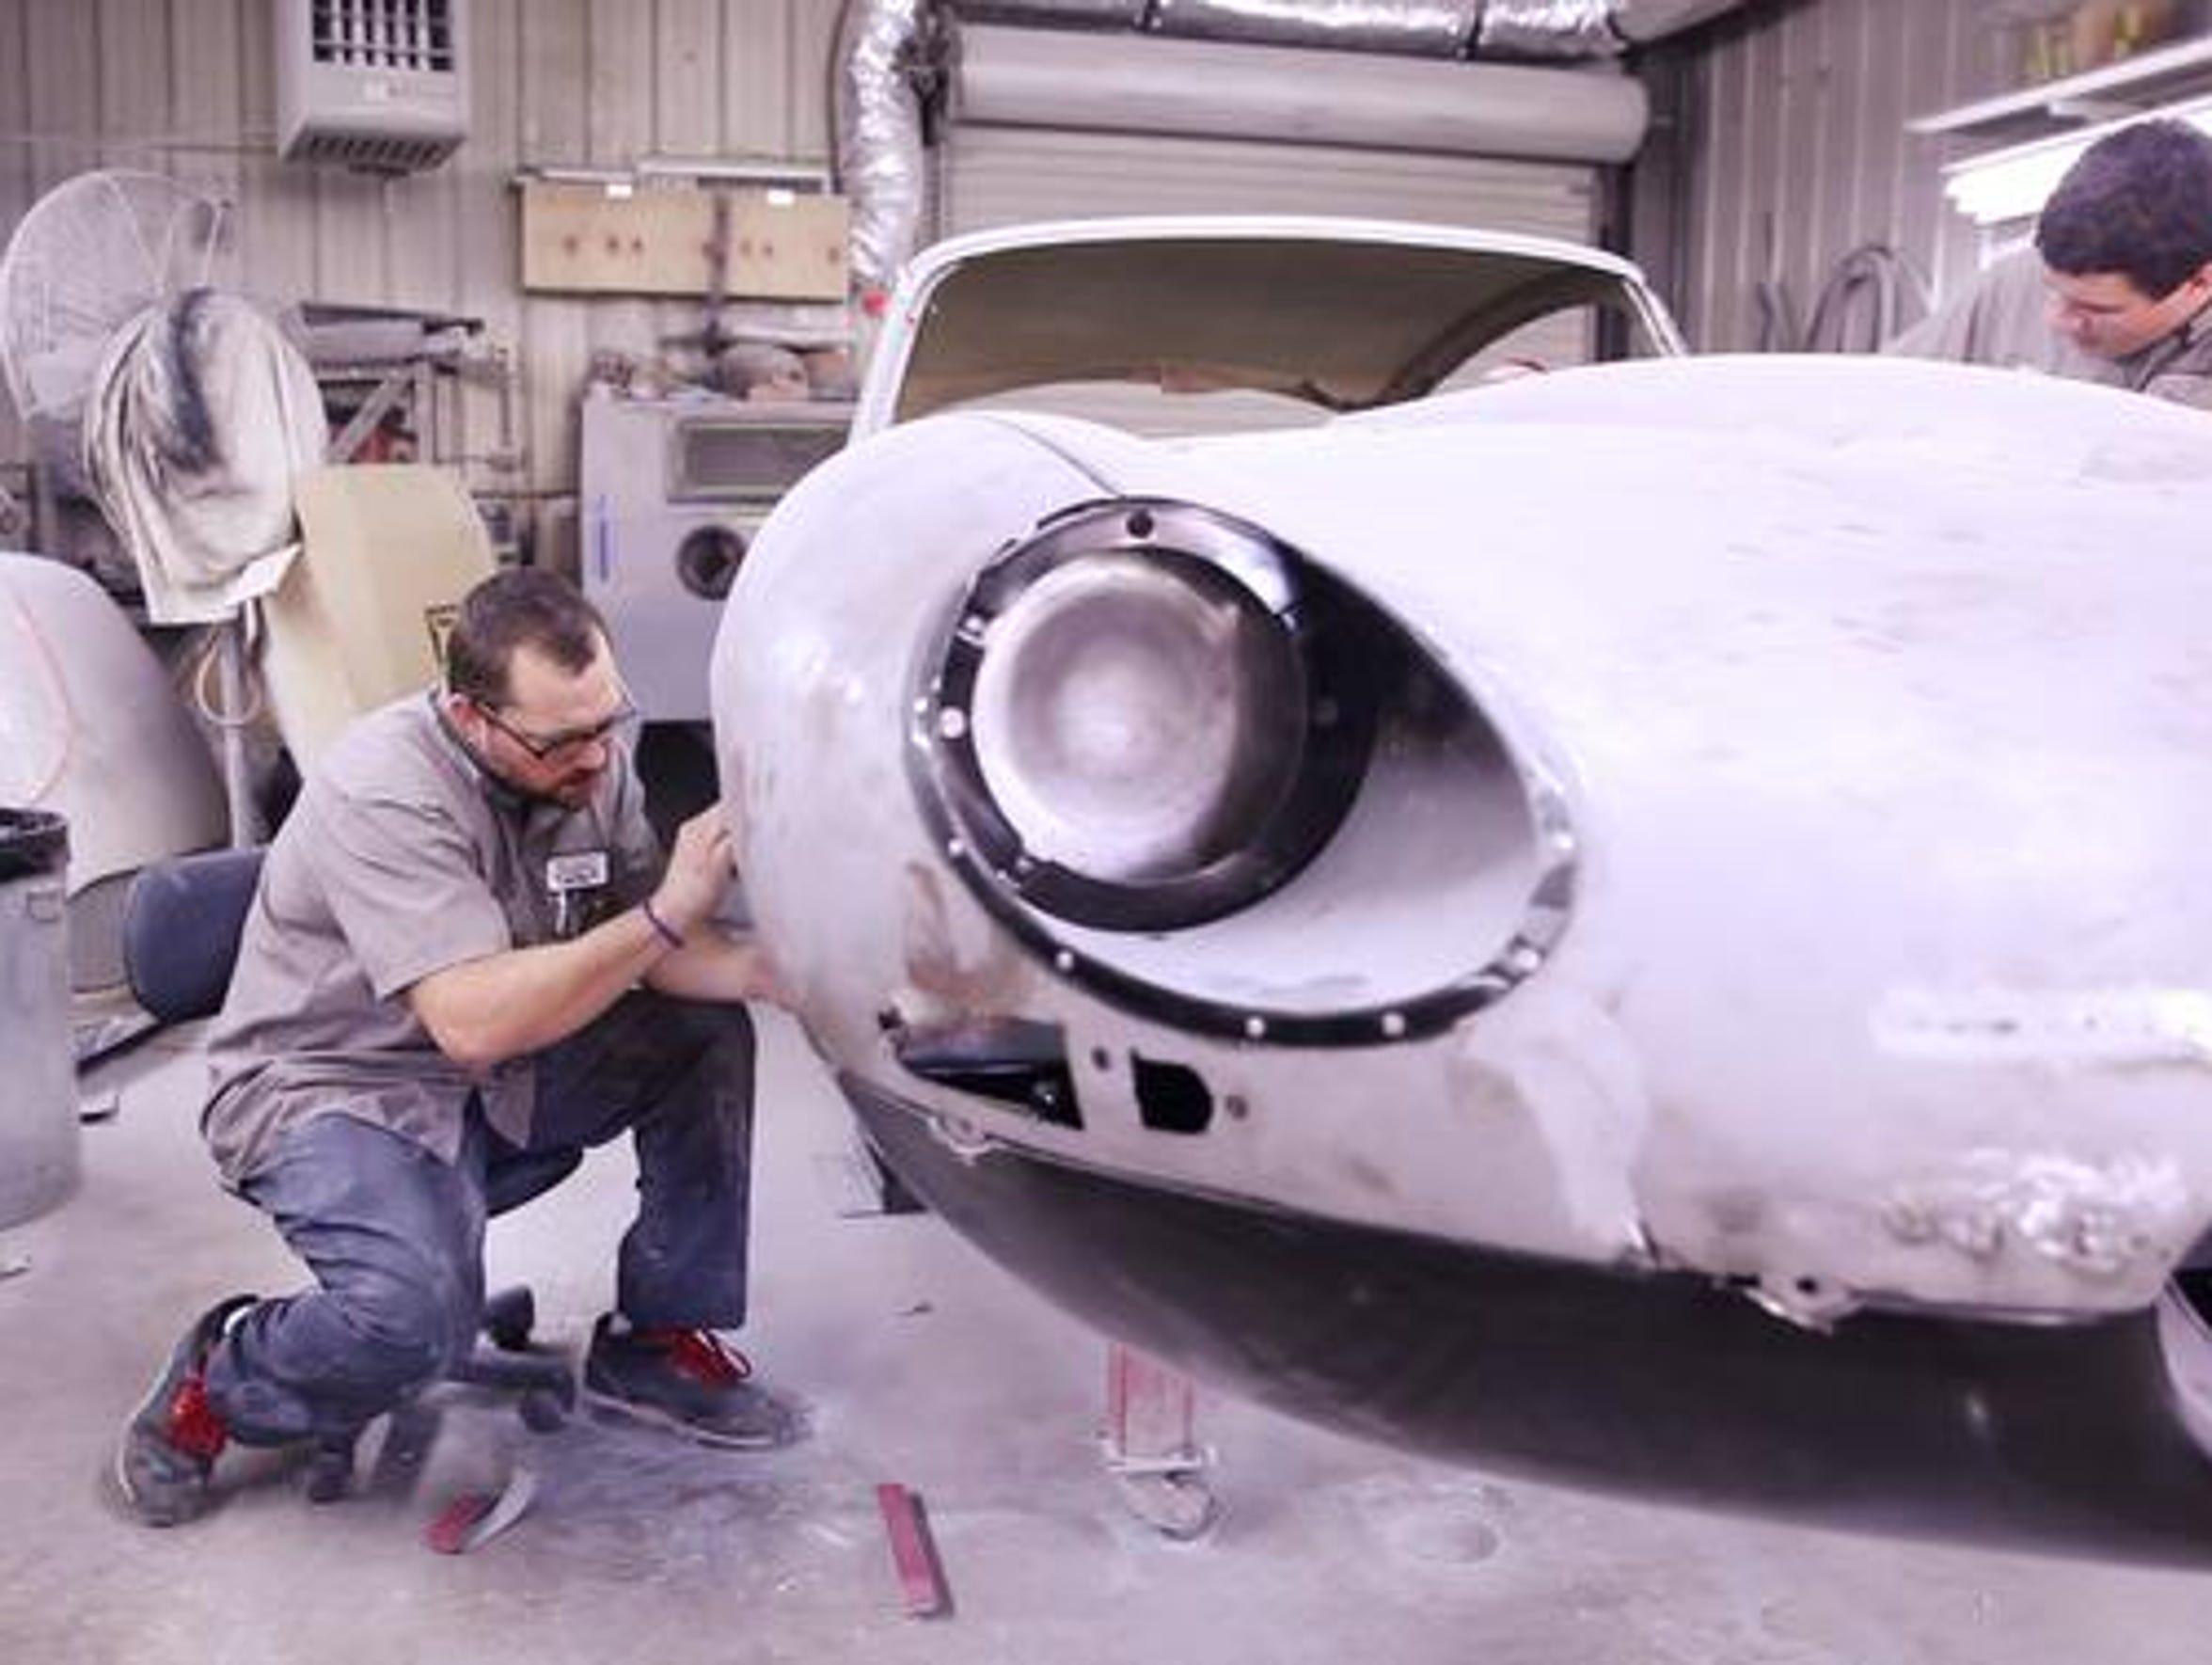 Auto body technicians Johnny Simonetti, left, of Staunton,